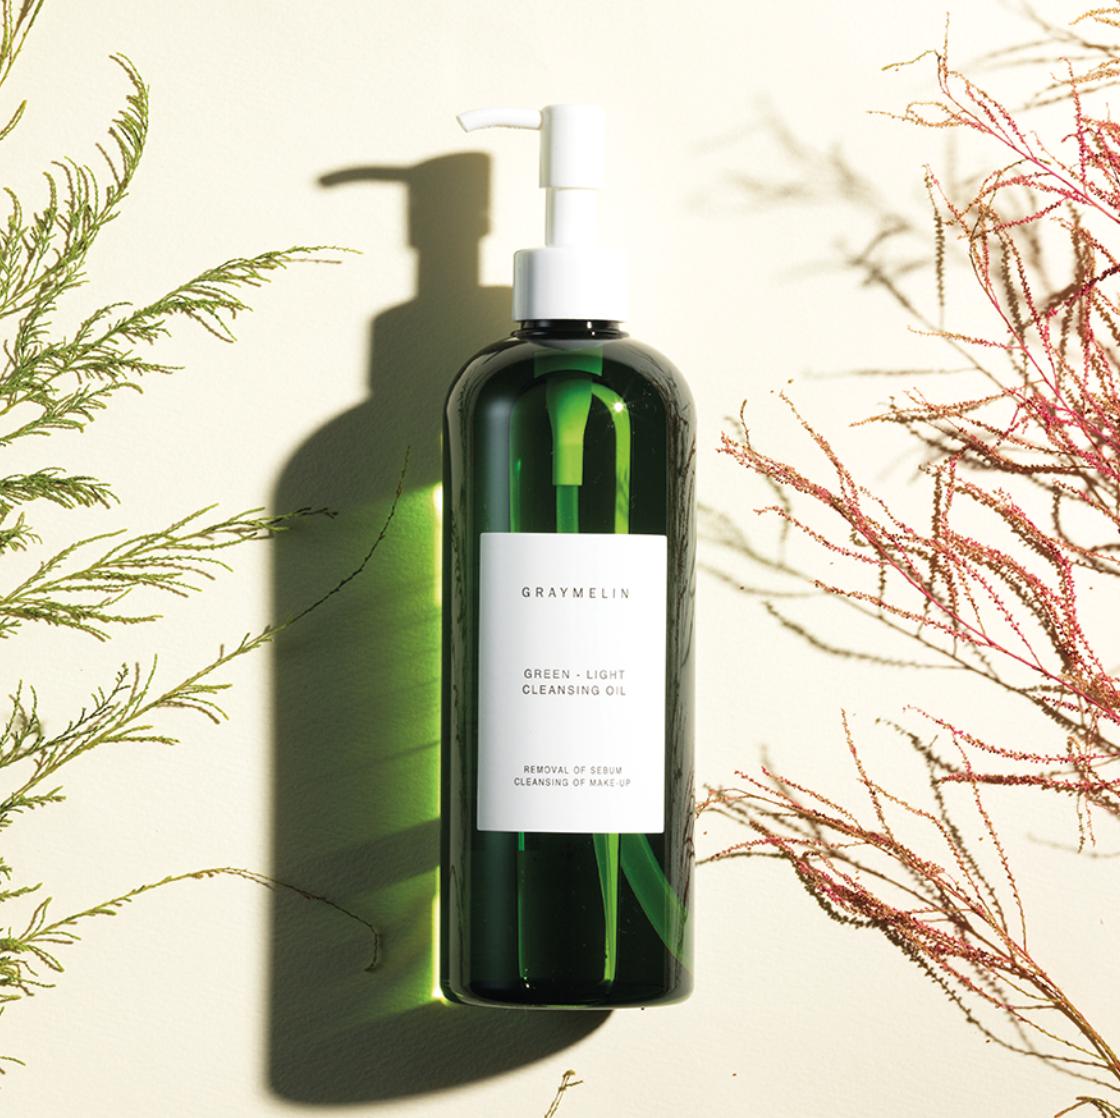 graymelin-green-light-cleansing-oil-huile-demaquillante-coreenne-naturelle-bio-avis-revue-그레이멜린-그린라이트-오일